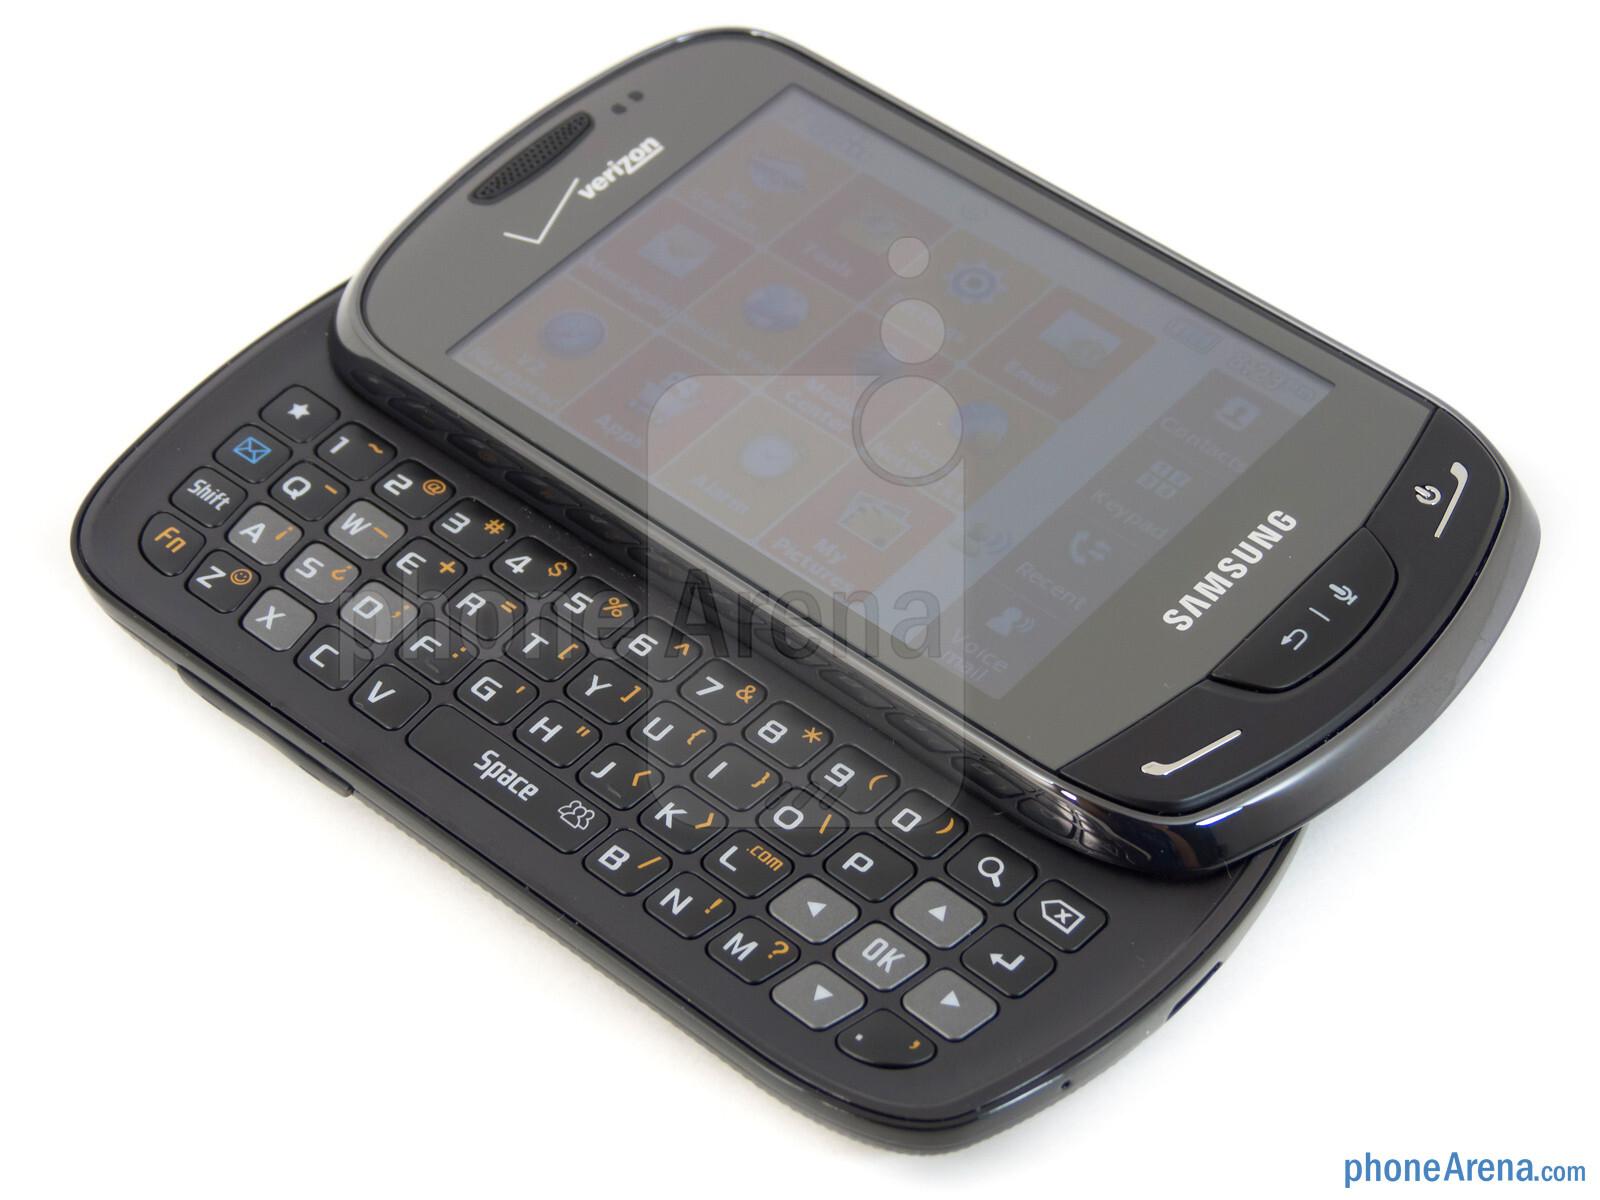 Samsung Brightside Review